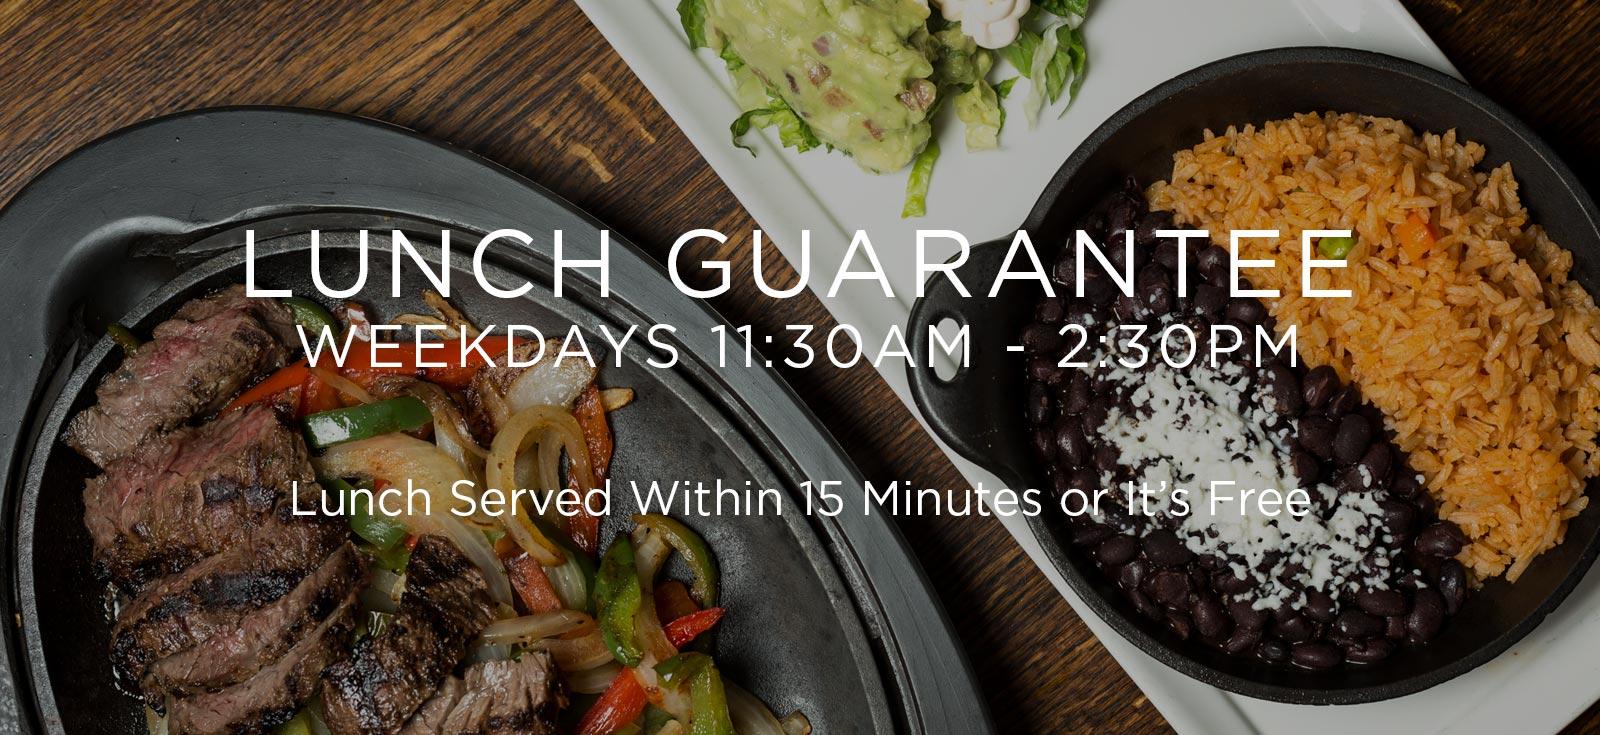 Lunch Guarantee